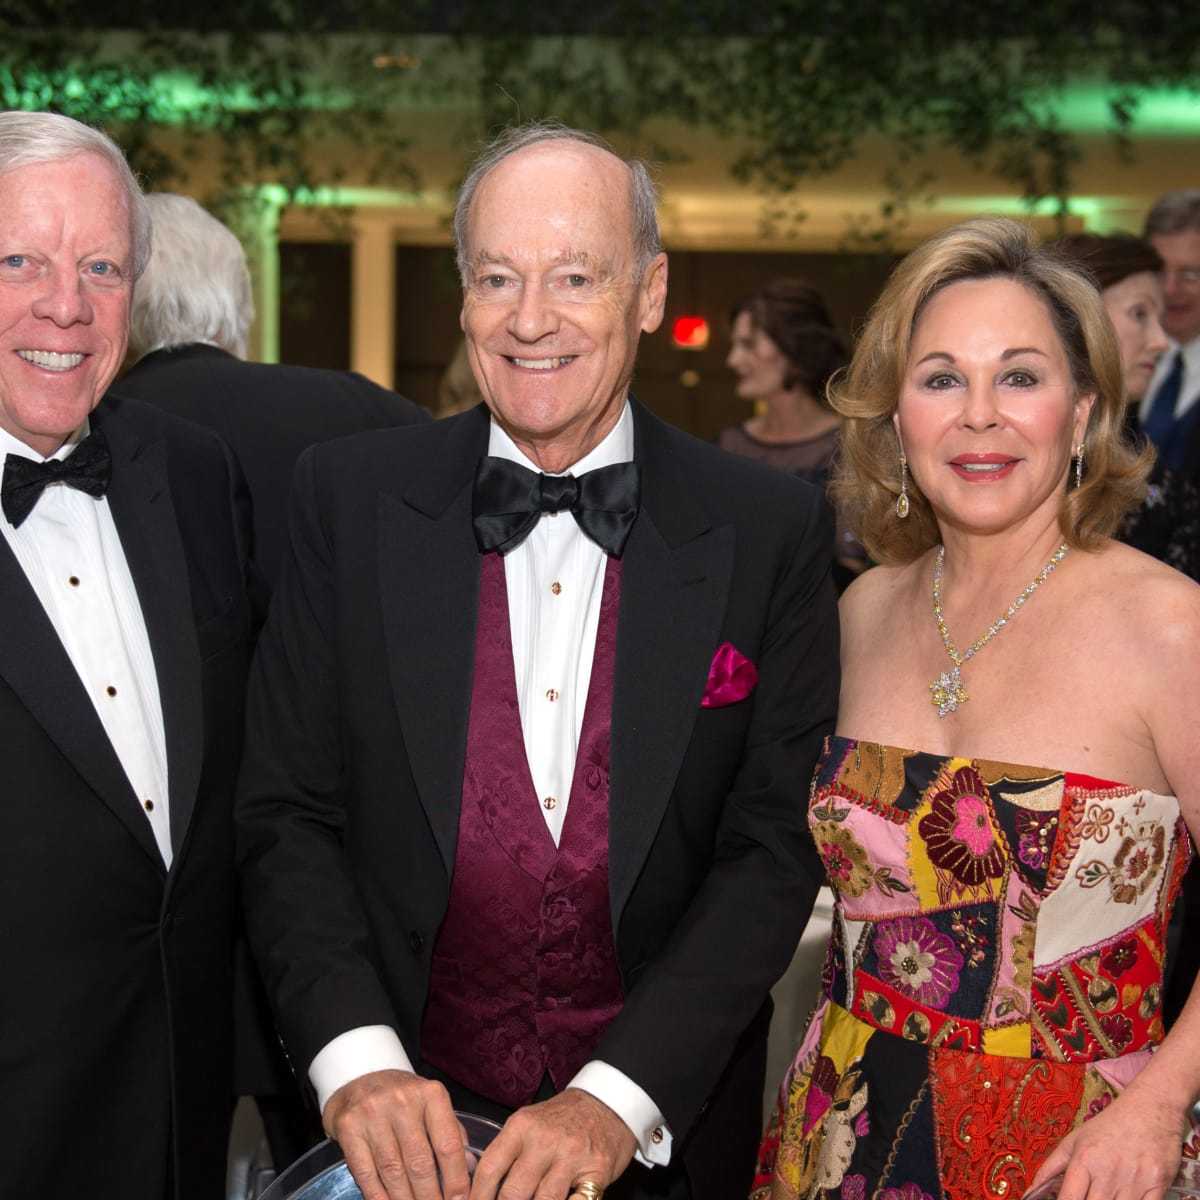 Houston, MFAH Art of the Islamic Worlds Gala, November 2017, Rich Kinder, Prince Amyn, Nancy Kinder